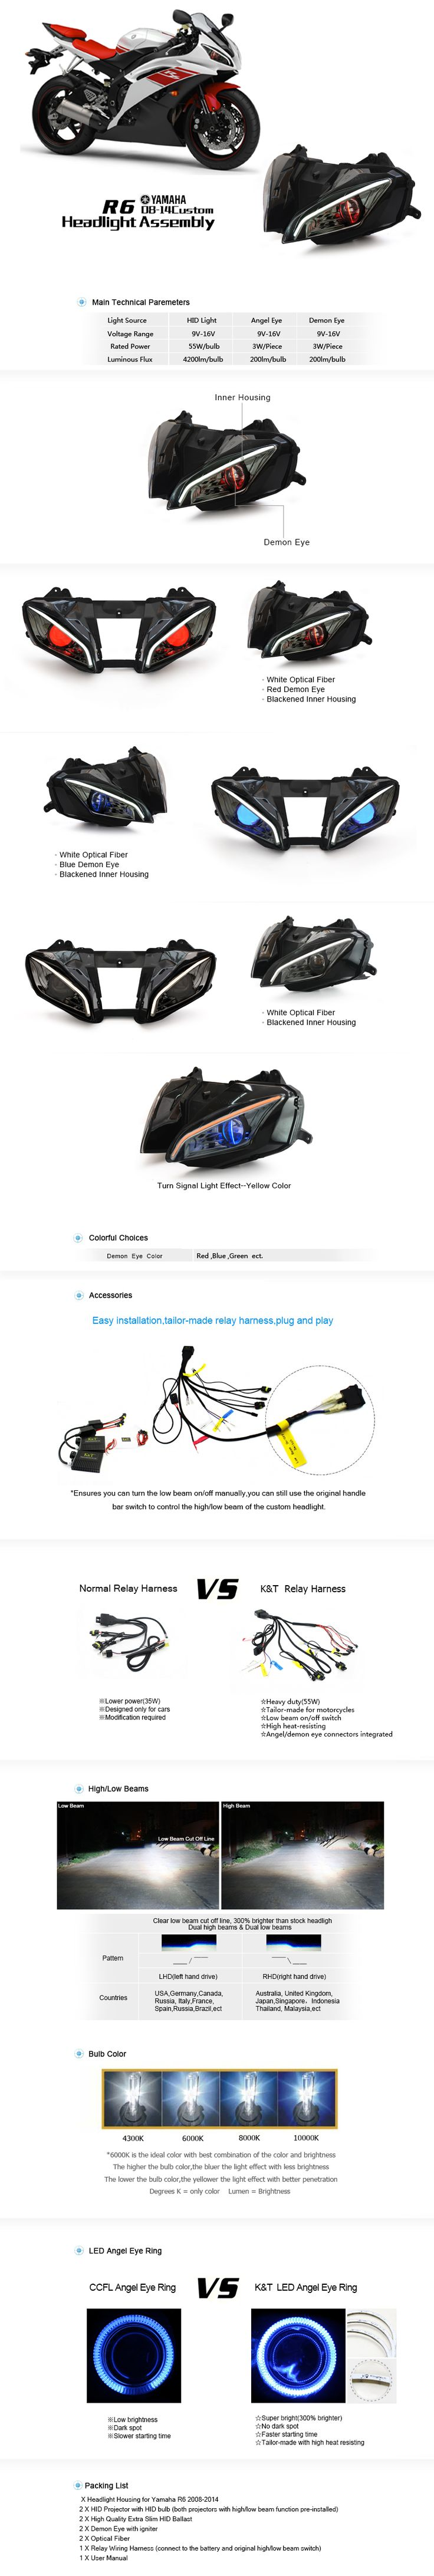 Yamaha yzf r6 optical fiber custom headlight assembly 2008 2014 v2